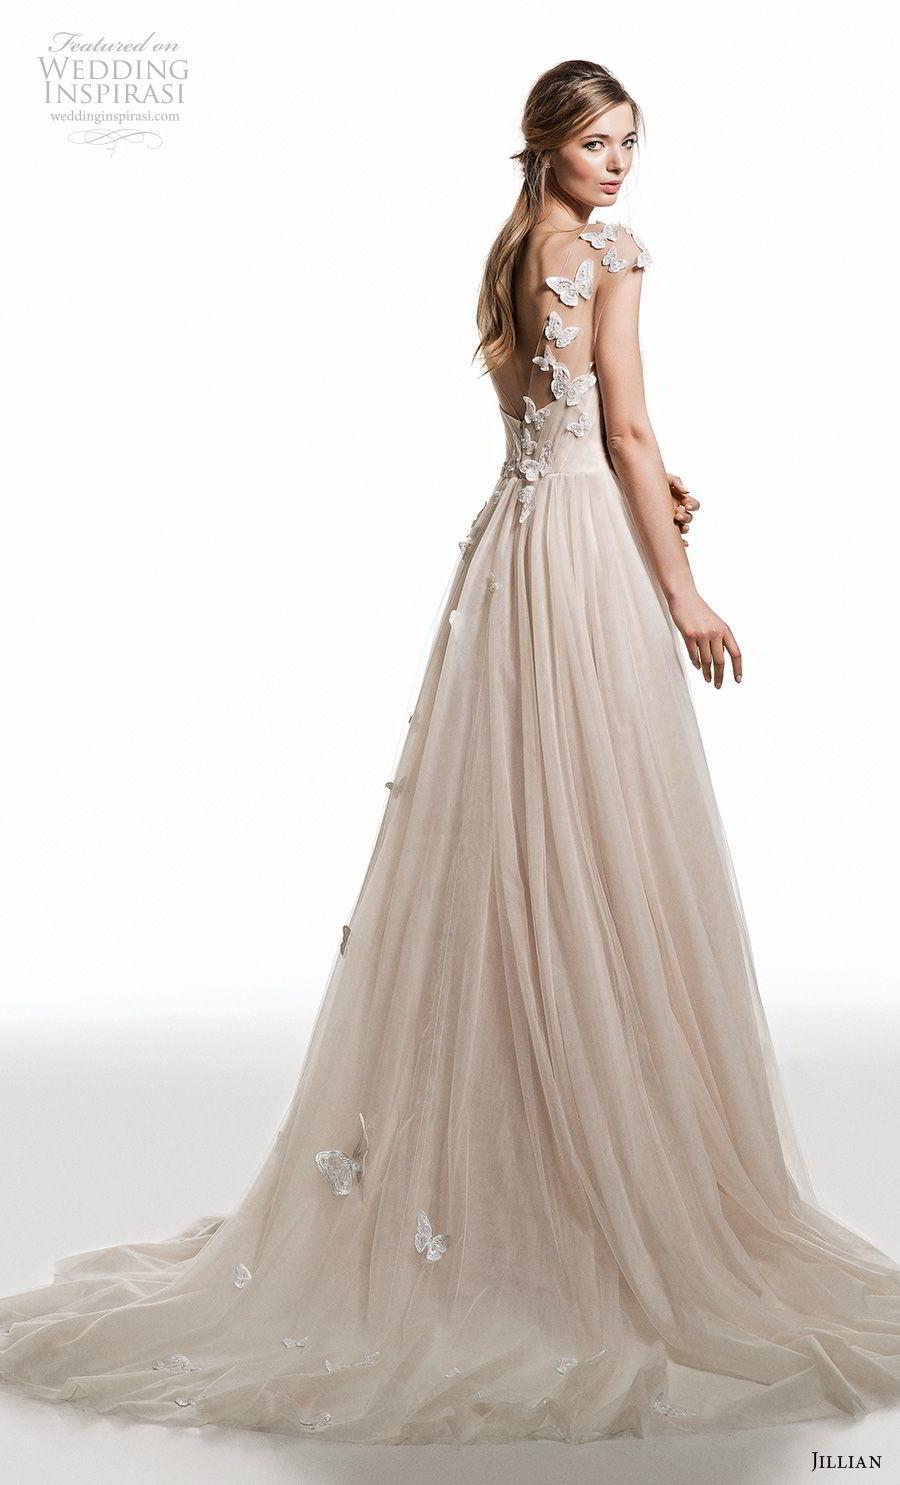 jillian 2019 bridal cap sleeves illusion bateau sweetheart neckline heavily embellished bodice romantic champagne modified a  line wedding dress open back medium train (5) bv